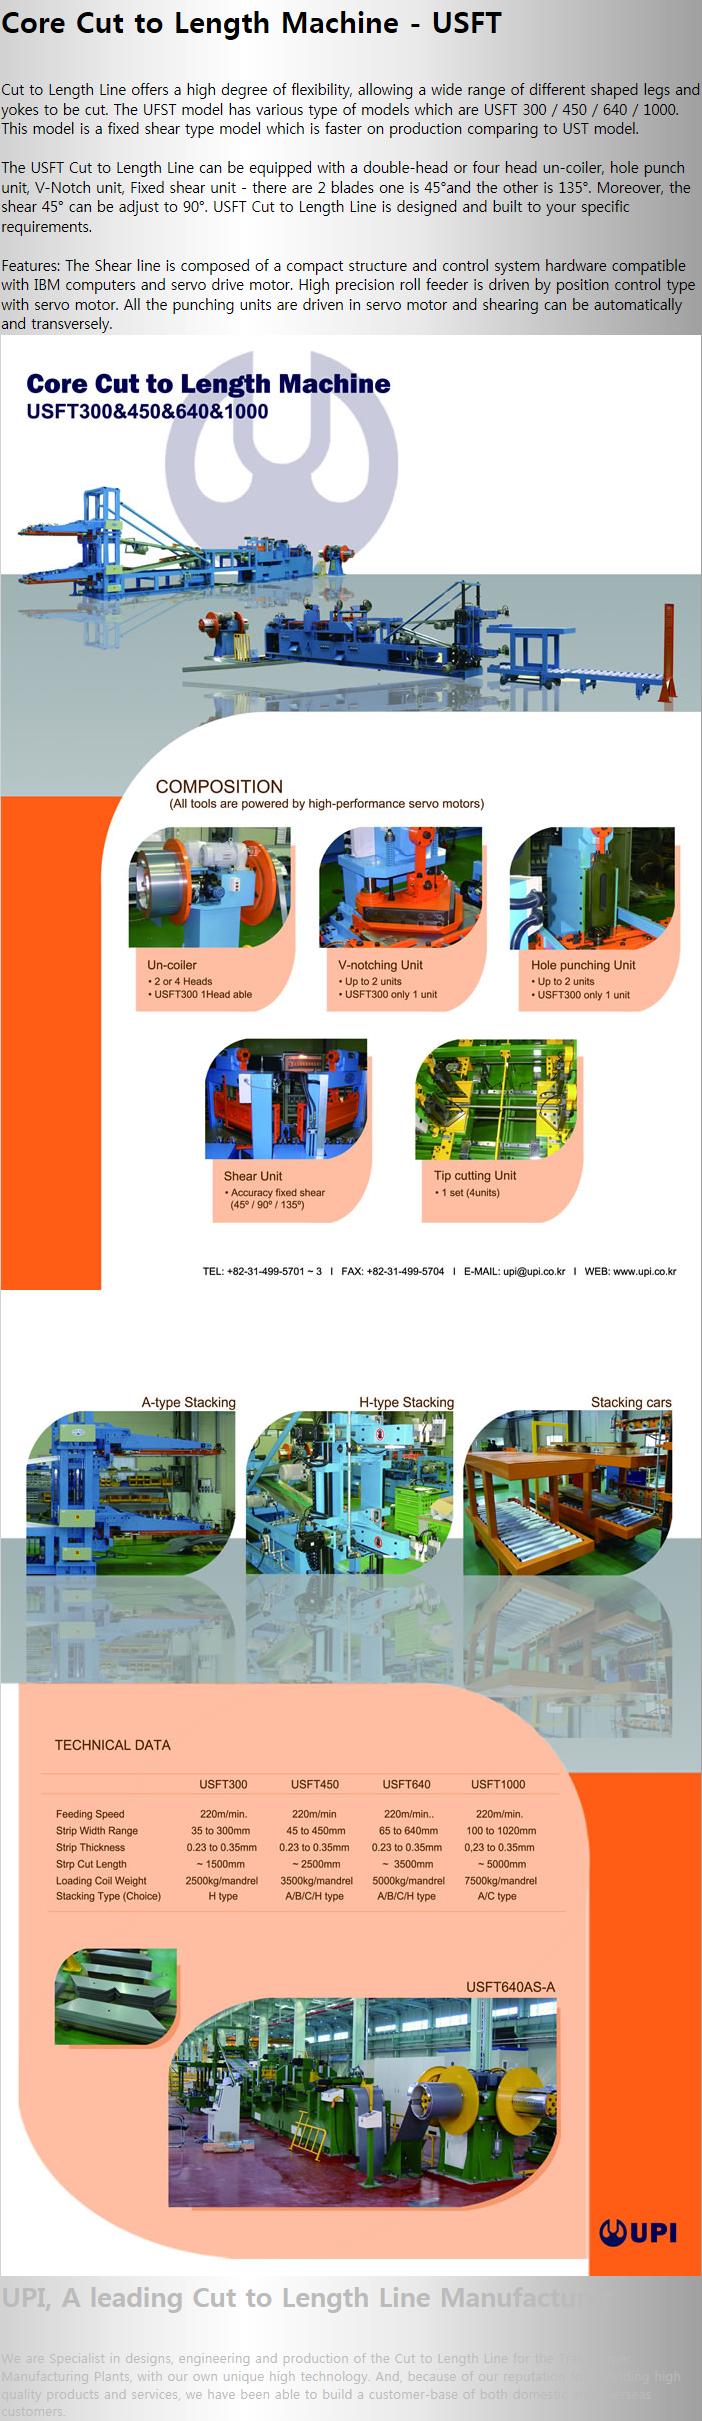 UPI Core Cut to Length Machine USFT